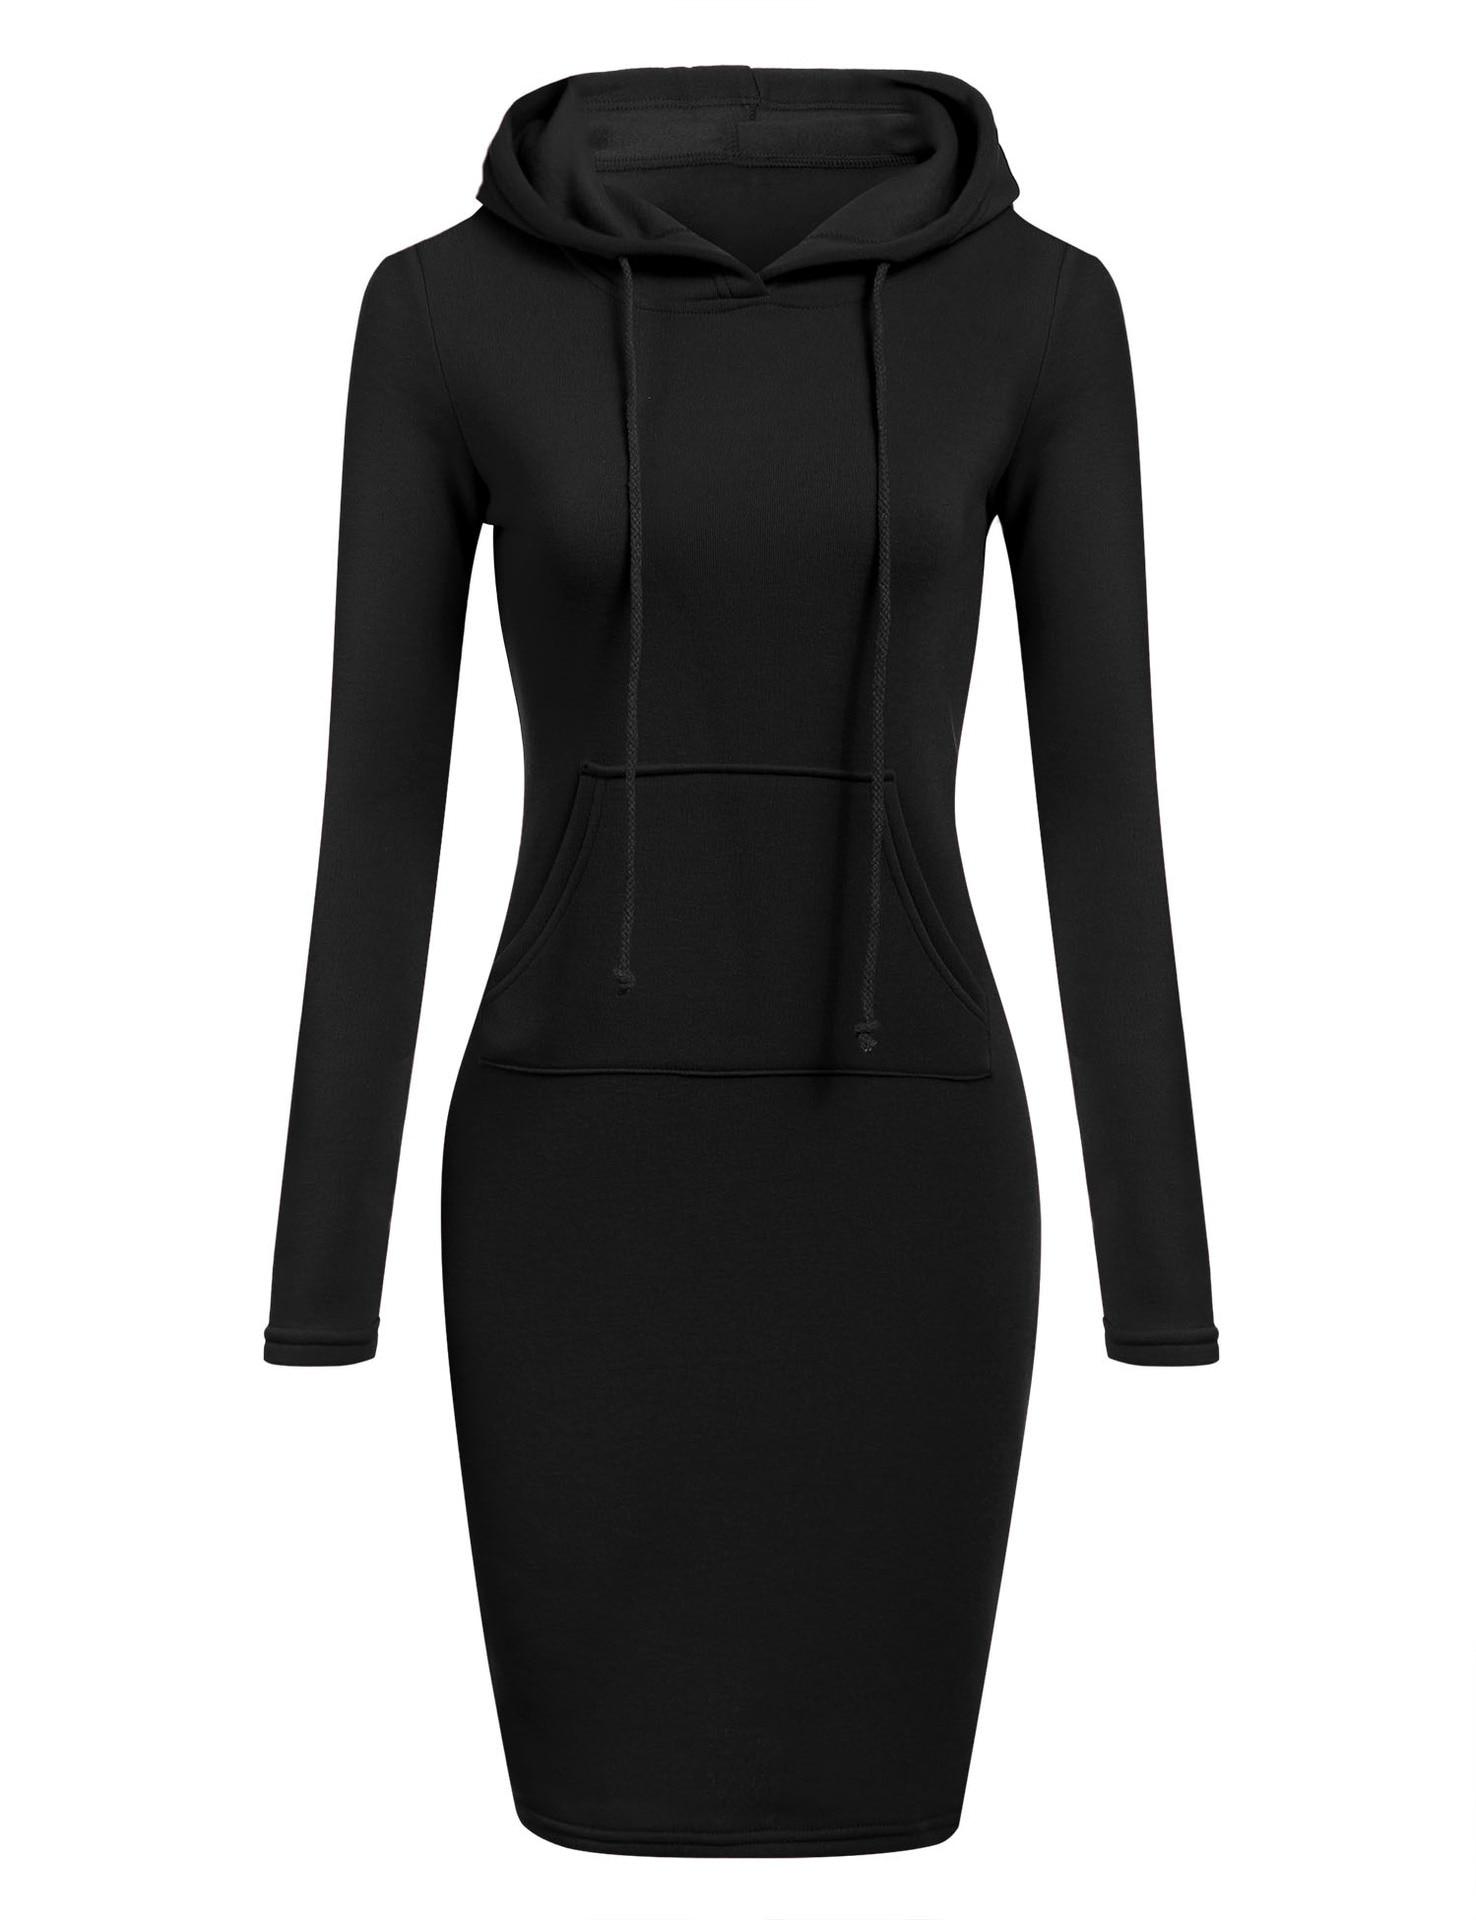 Autumn Winter Warm Sweatshirt Long-sleeved Dress Woman Clothing Hooded Collar Pocket Simple Casual lady Dress Vesdies Sweatshirt 1